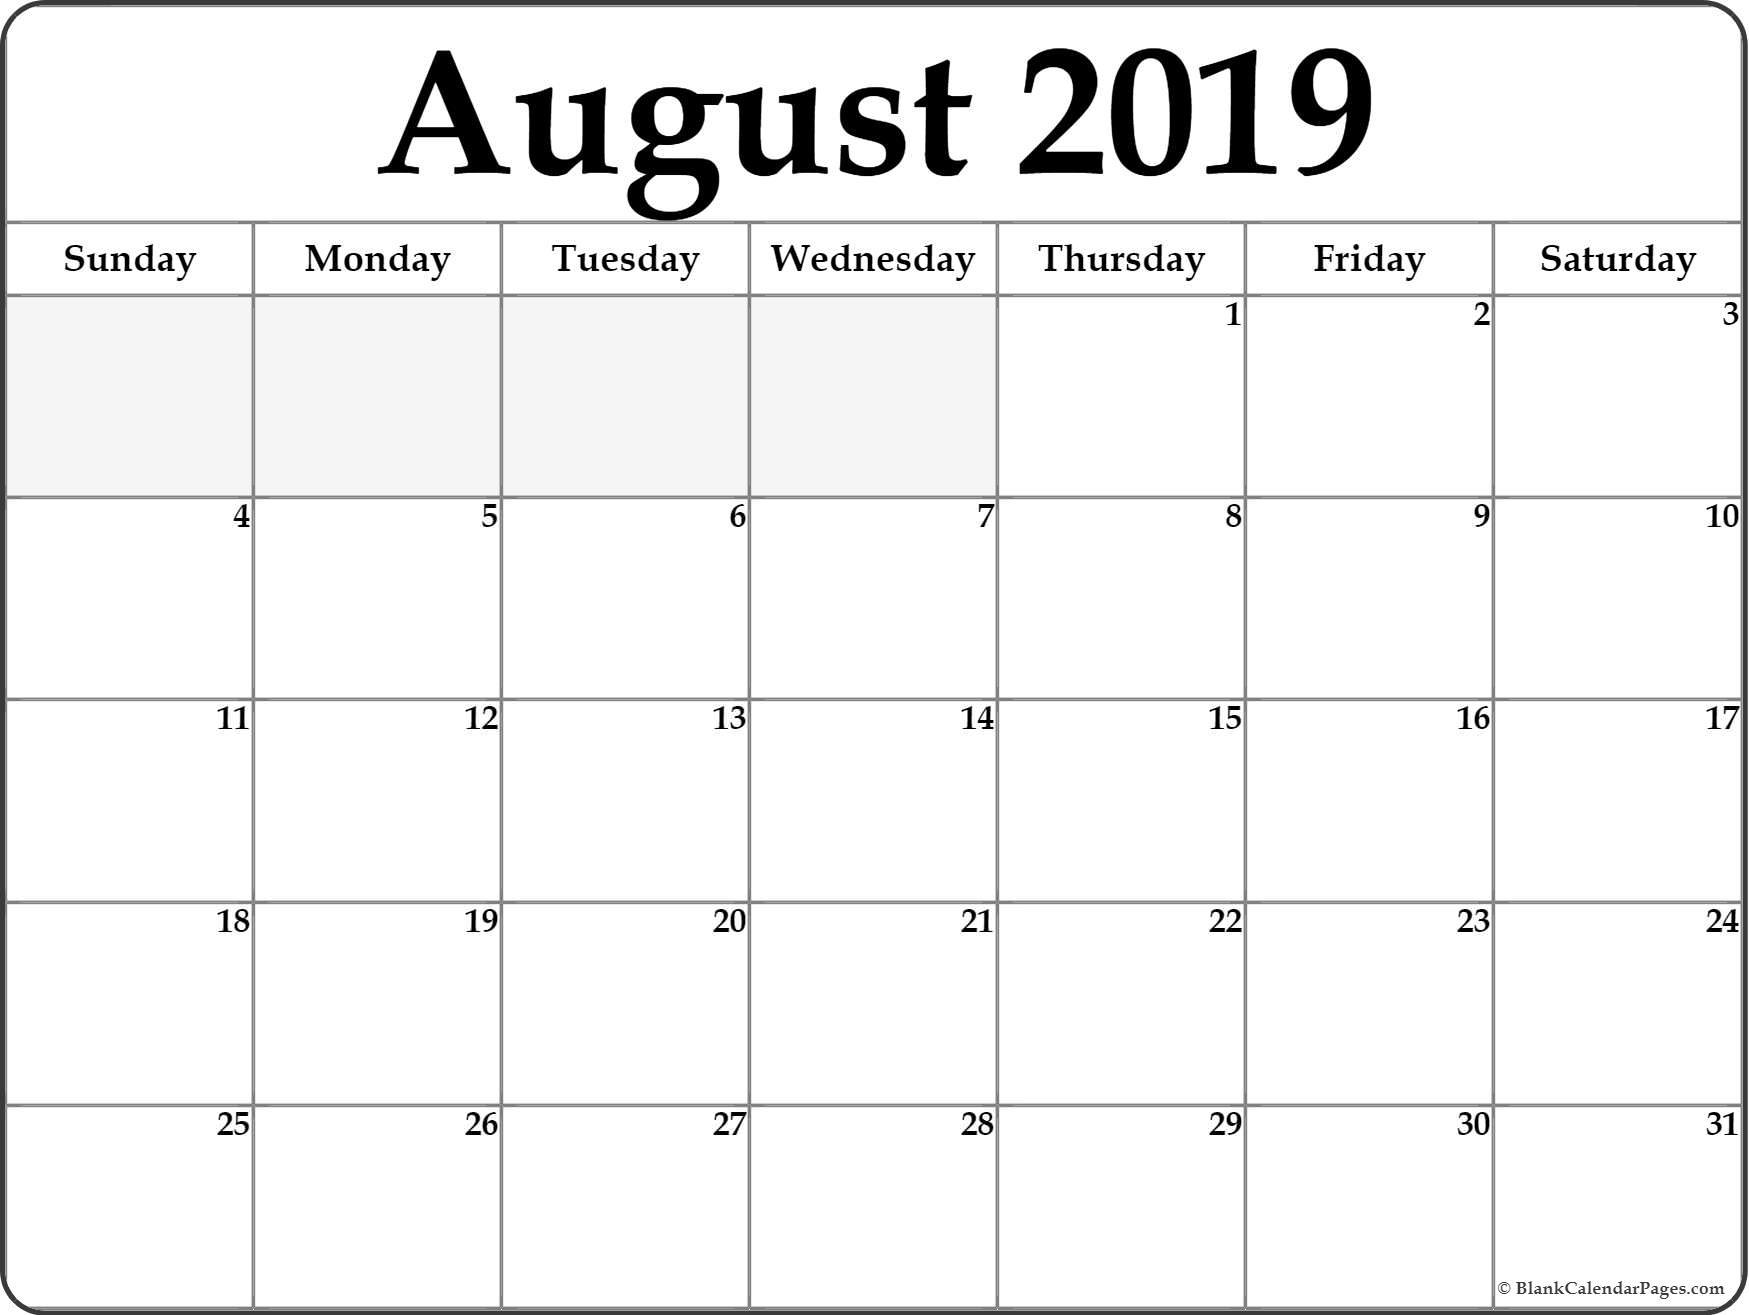 August 2019 Blank Calendar Templates. in Free Printable Calendar Templates 8 X 10